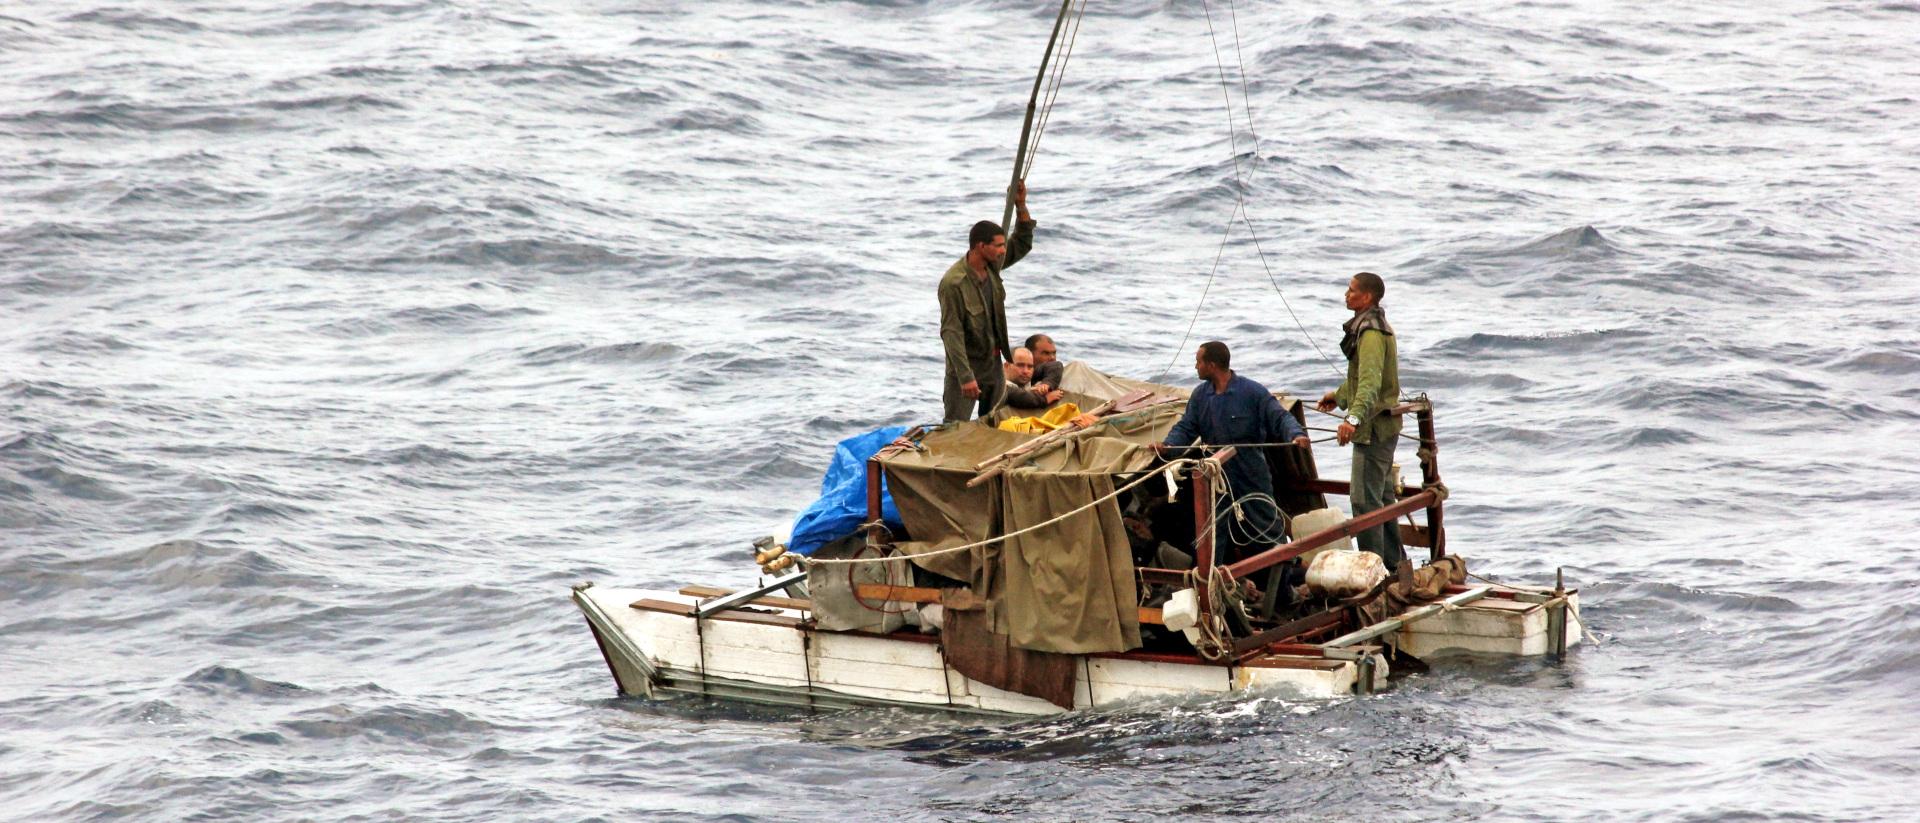 Flüchtlinge auf See